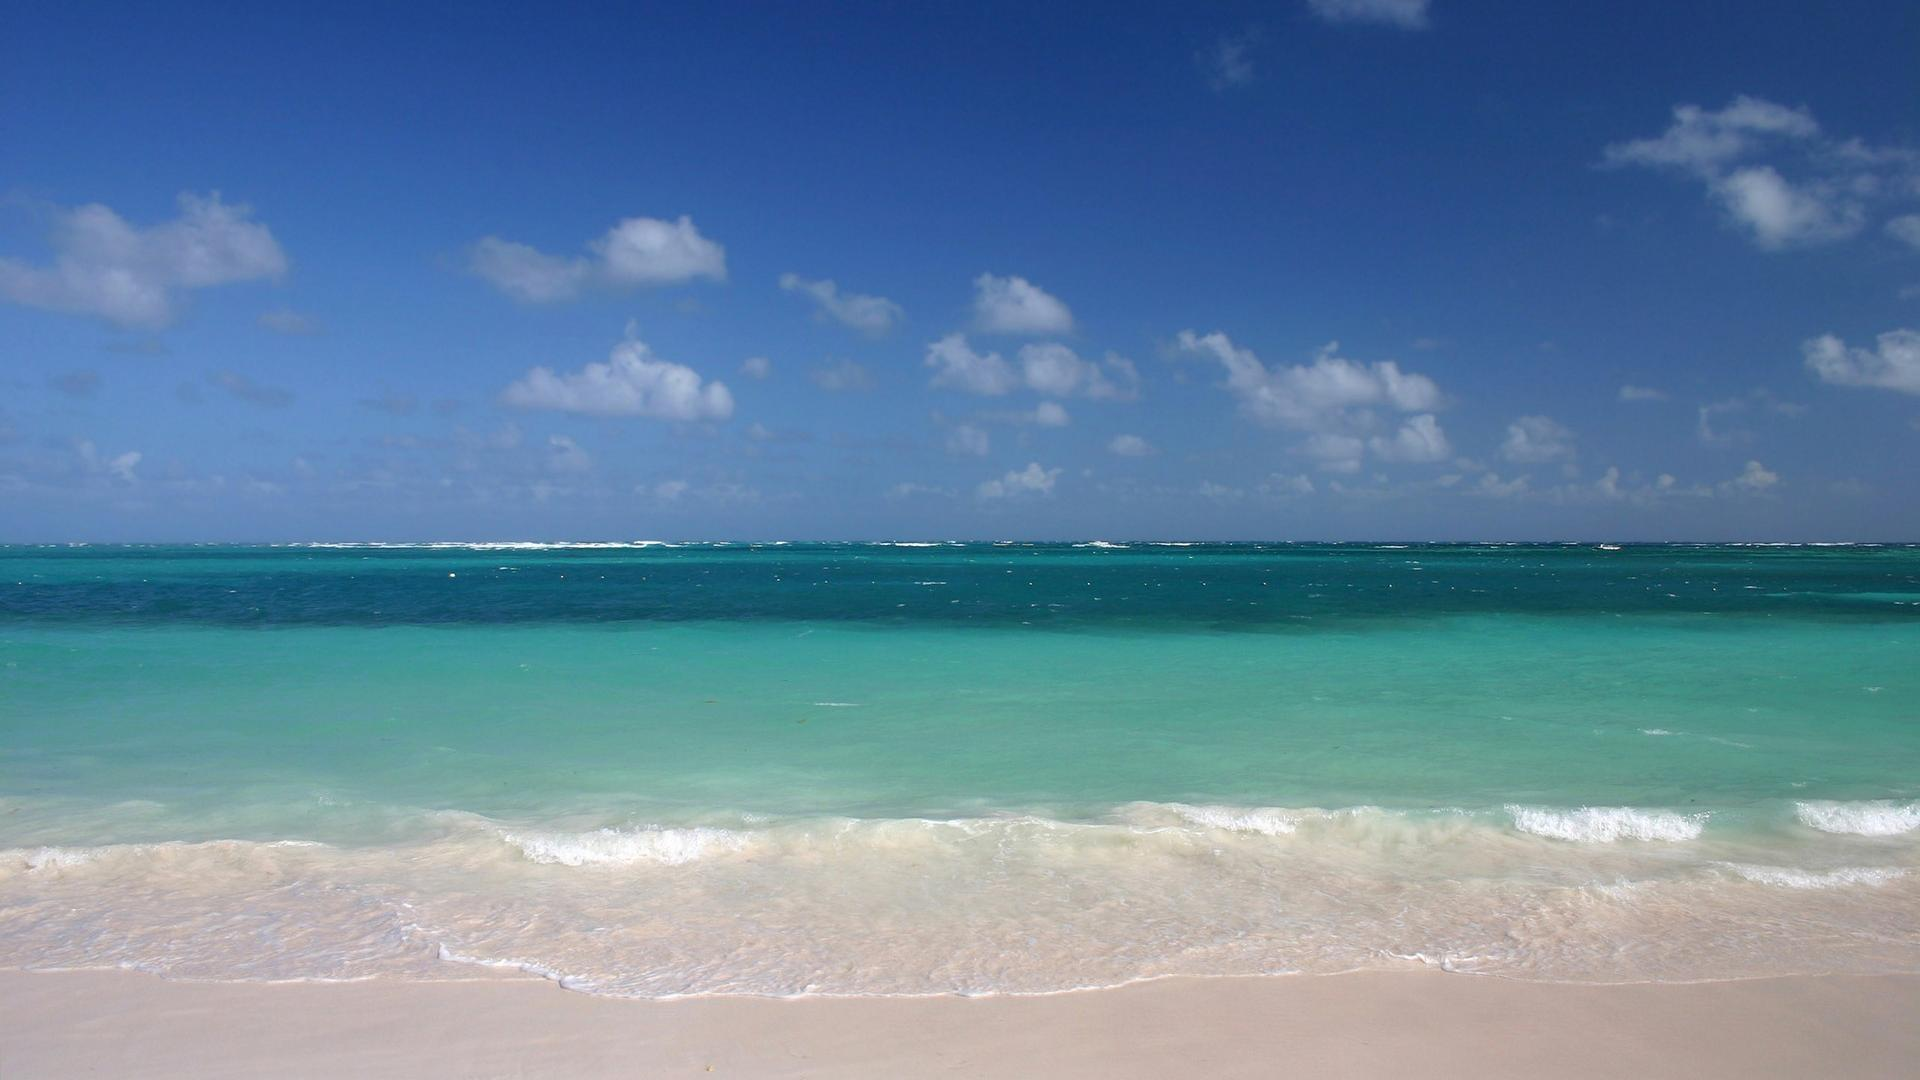 nature ocean sands water beach sky 1920x1080